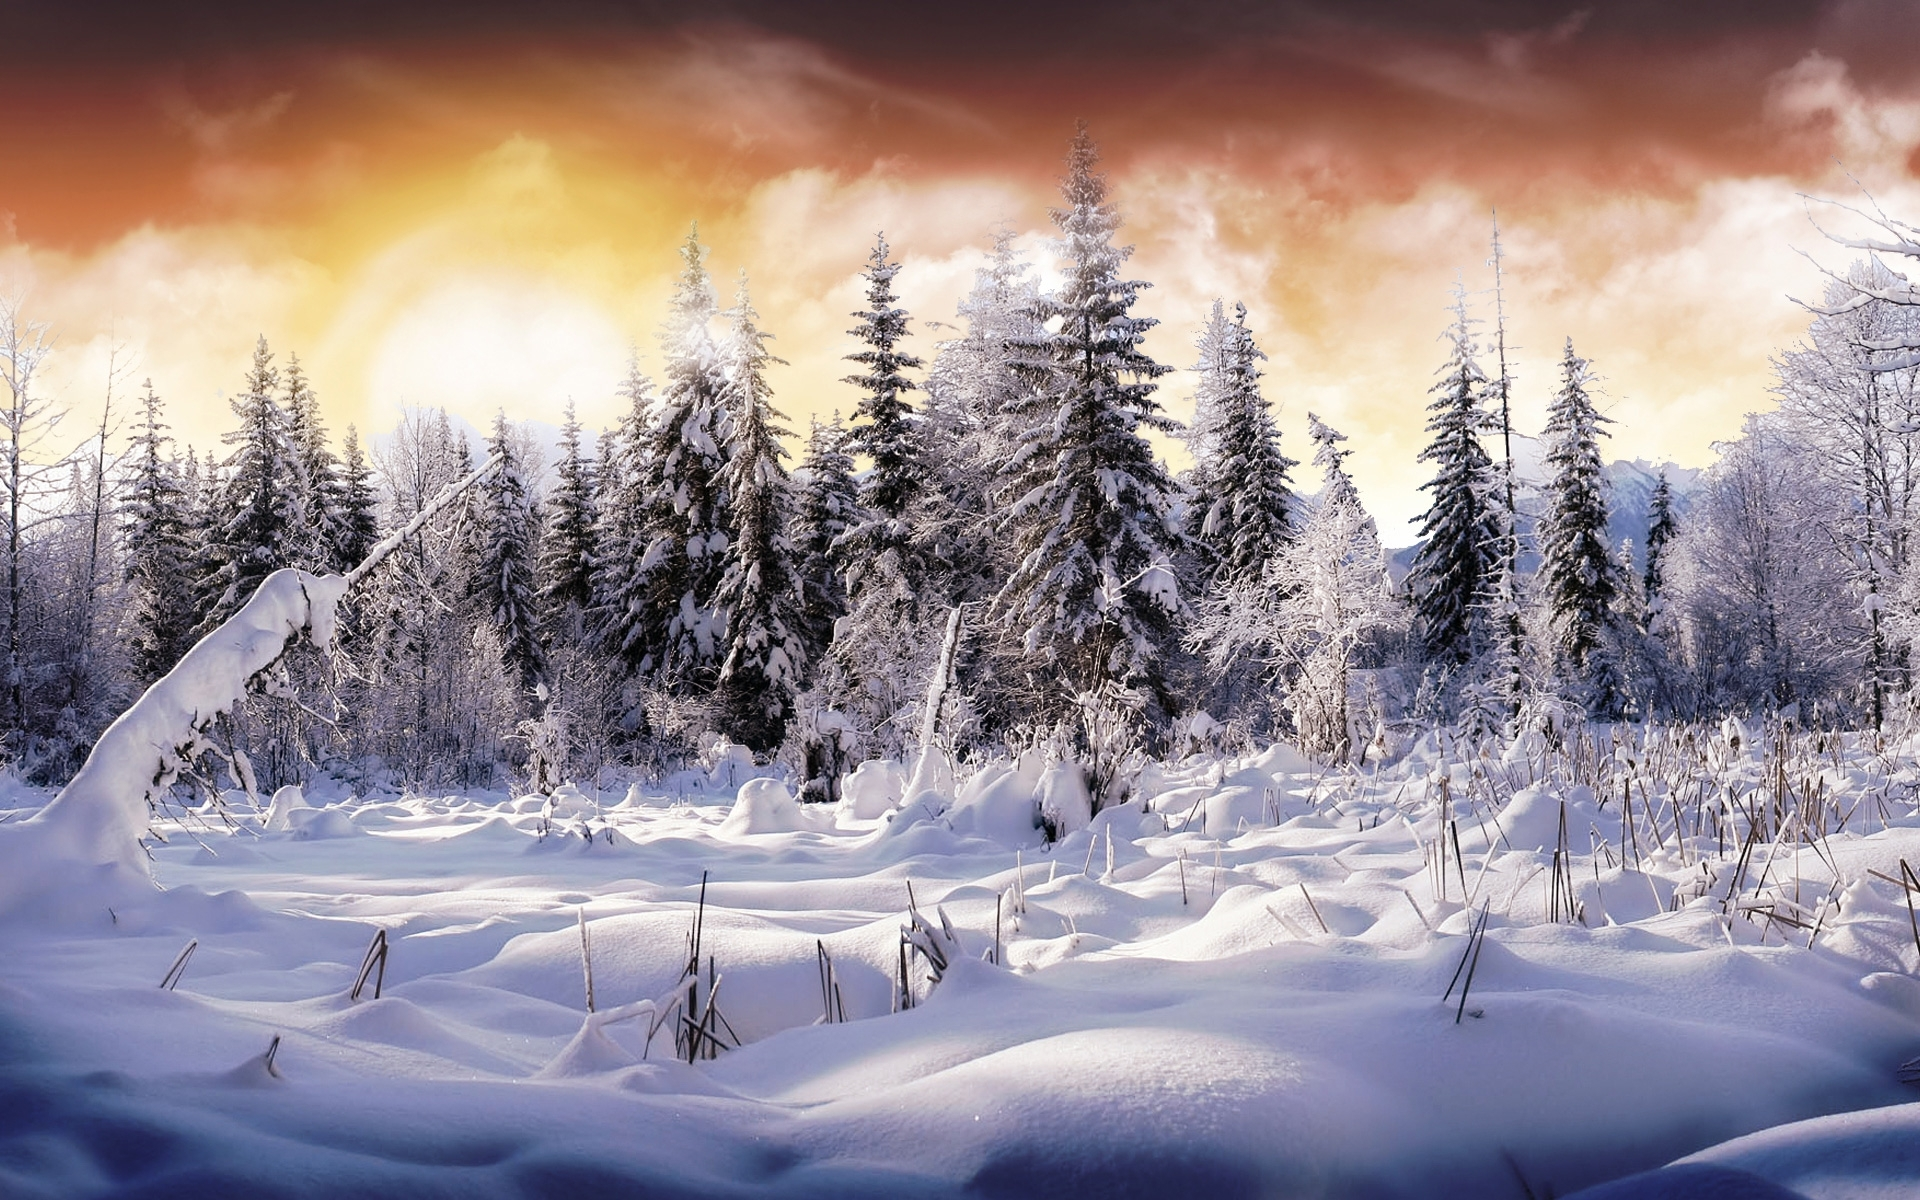 winter-wonderland-hd-wallpaper-free-for-desktop - hd wallpaper